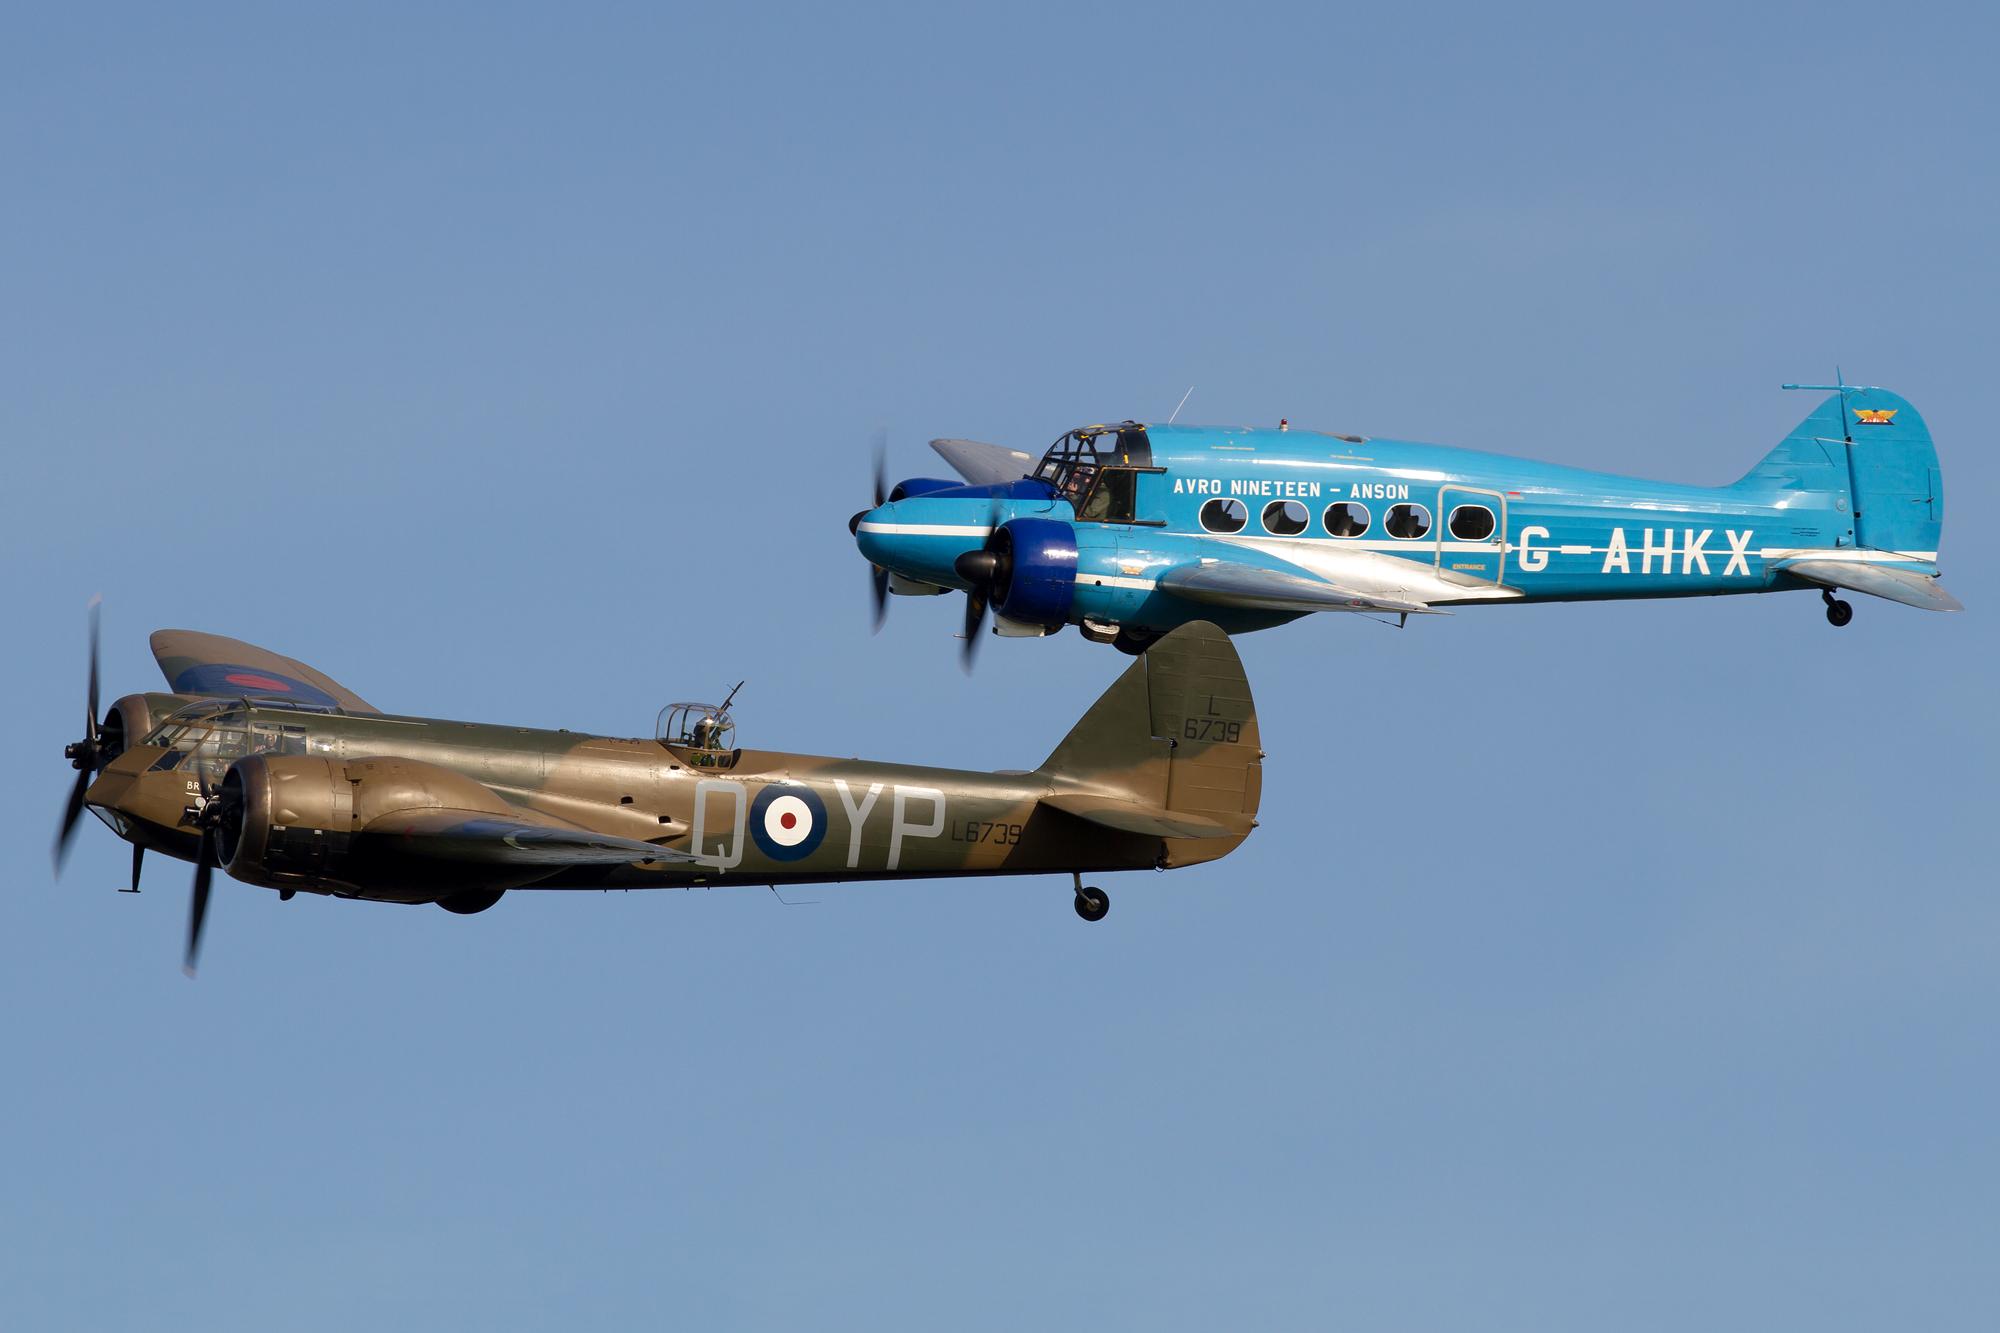 © Michael Lovering - Bristol Blenheim Mk.I and Avro 19 - Shuttleworth Season Premiere Airshow 2016